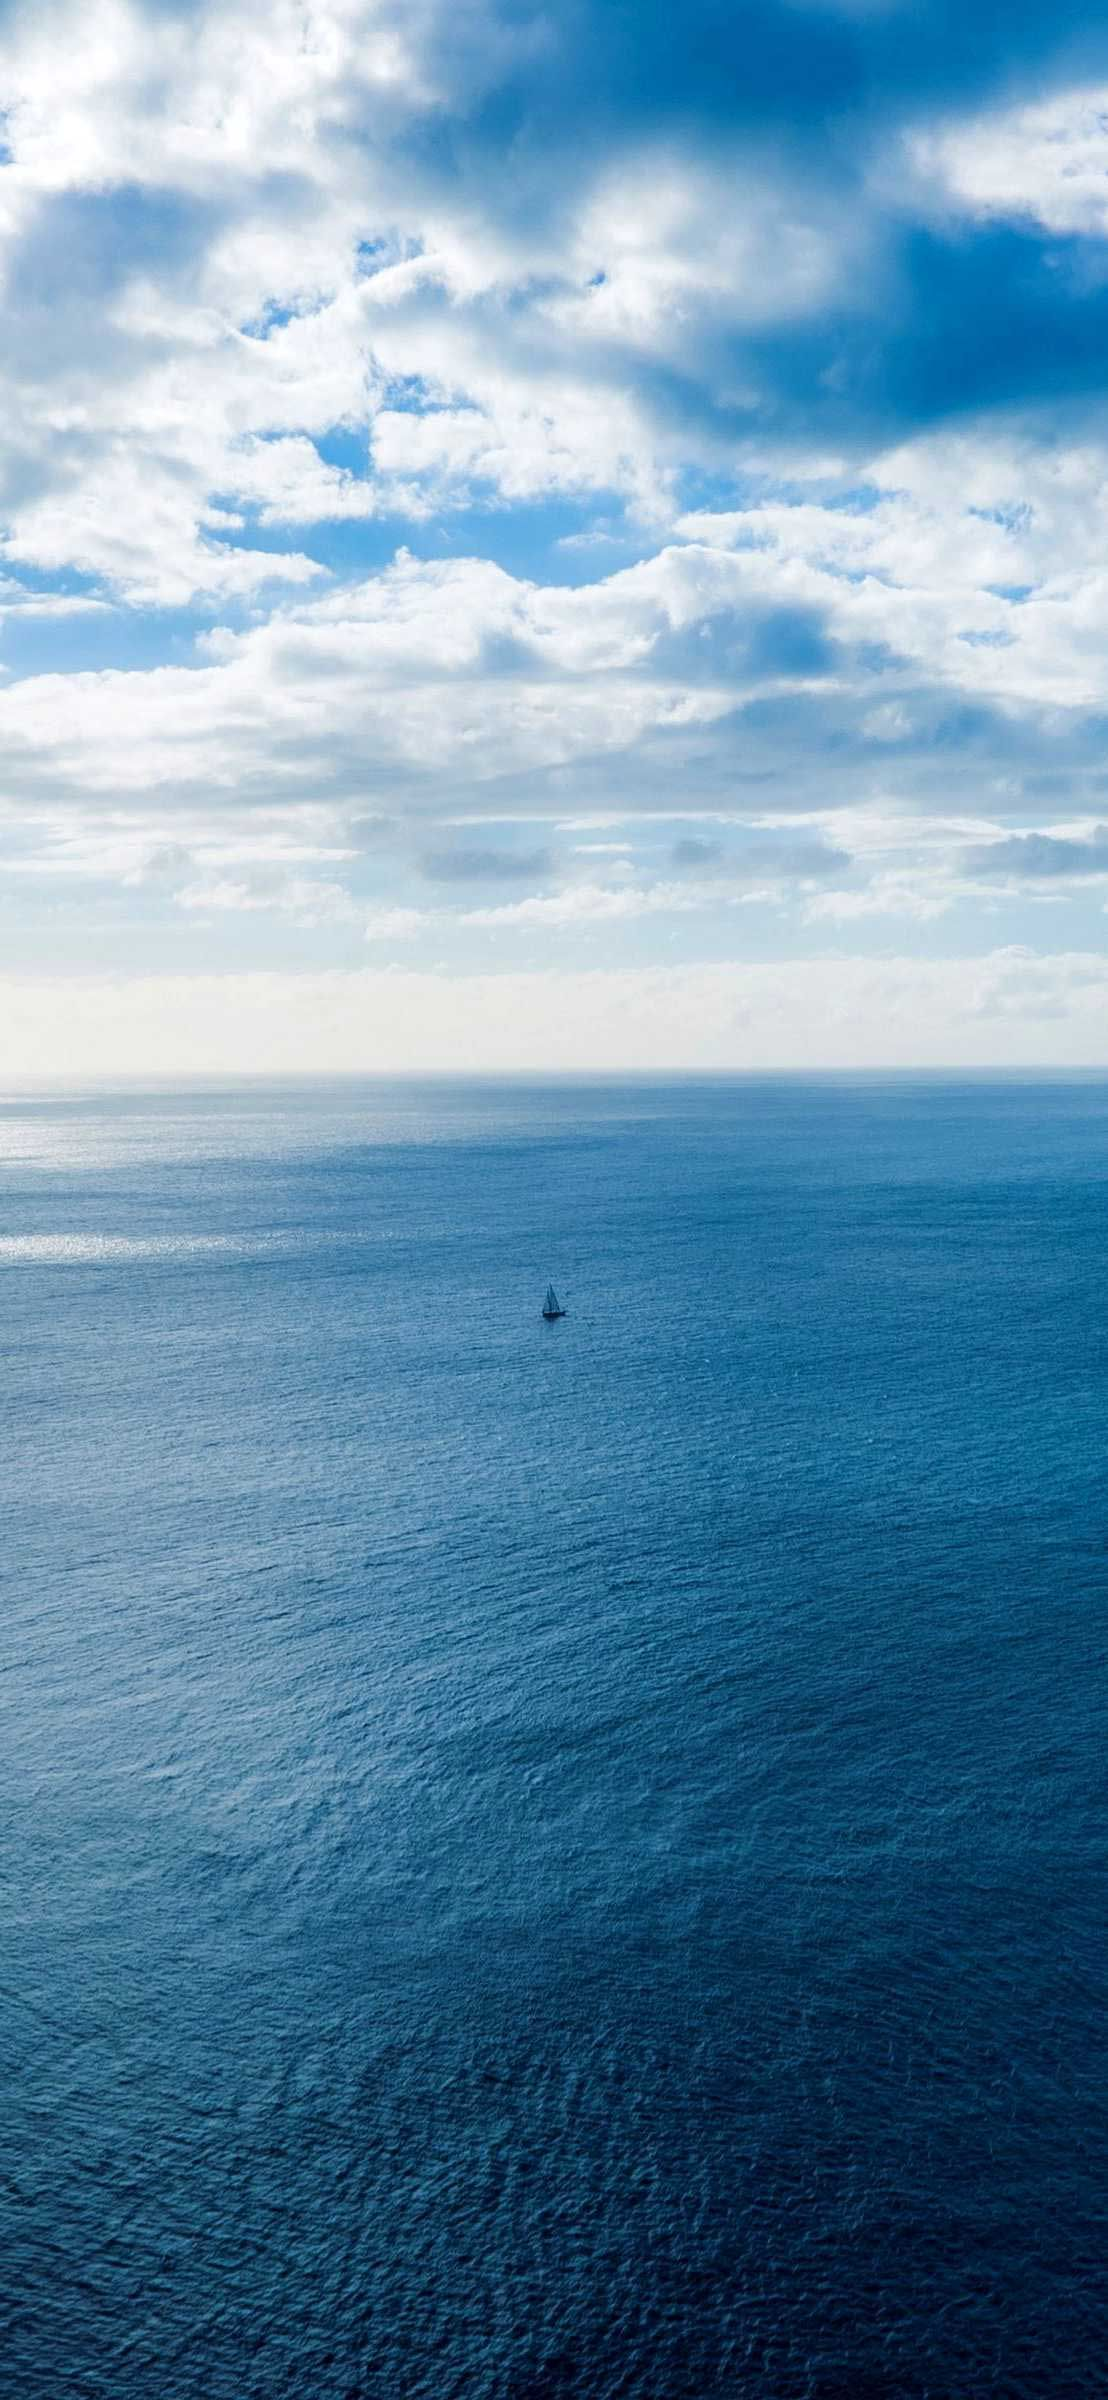 Iphone X Wallpapers Sea sky clouds horizon Hd in 2020